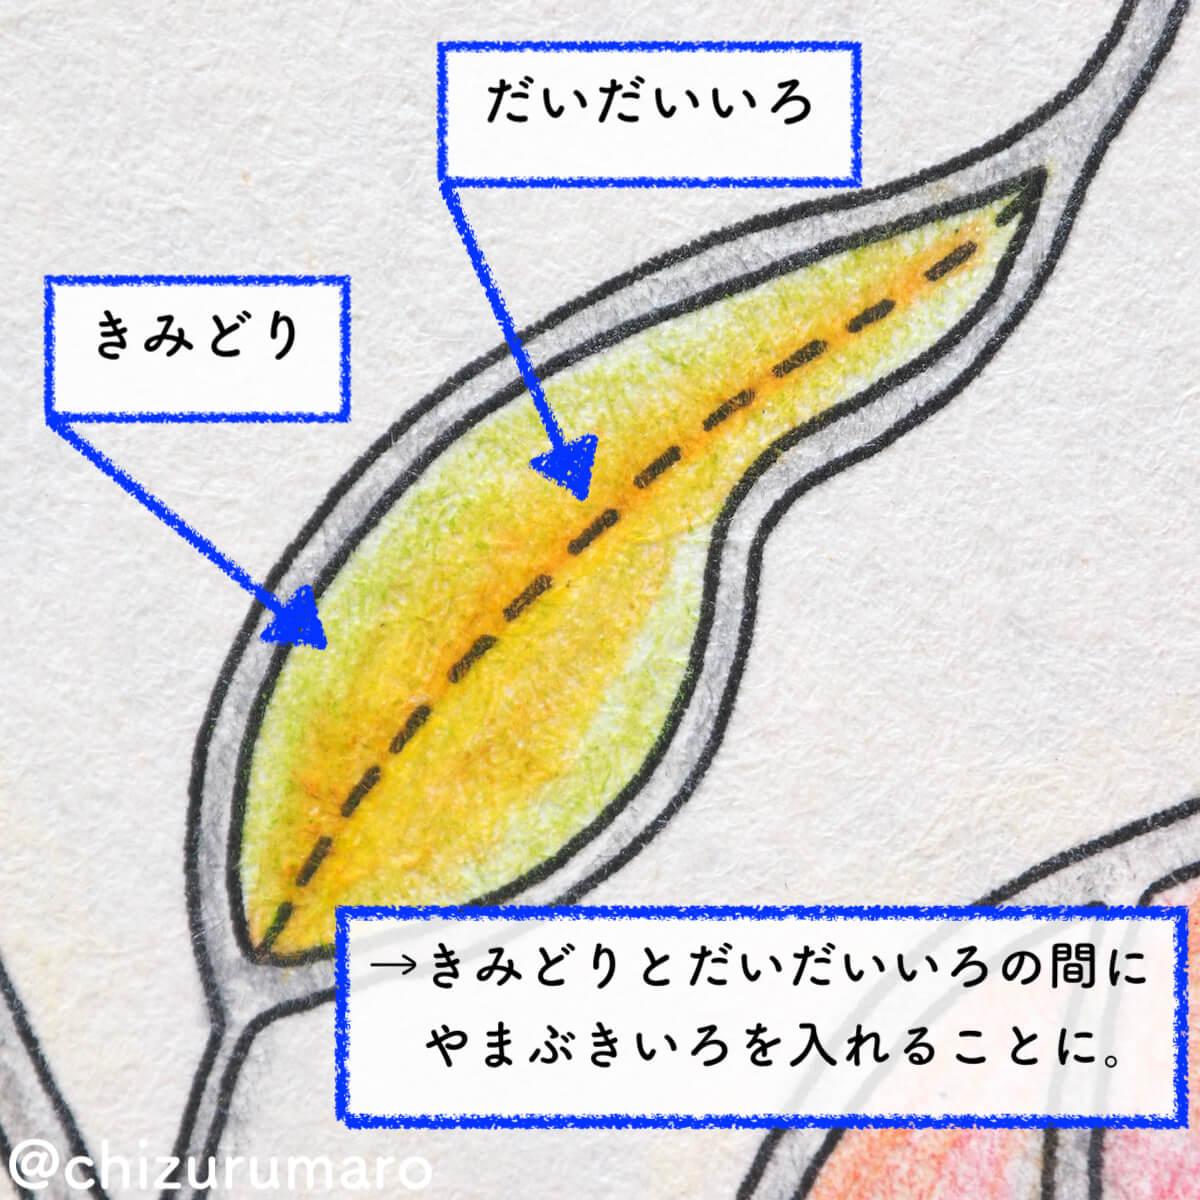 f:id:chizurumaro:20200518212432j:plain